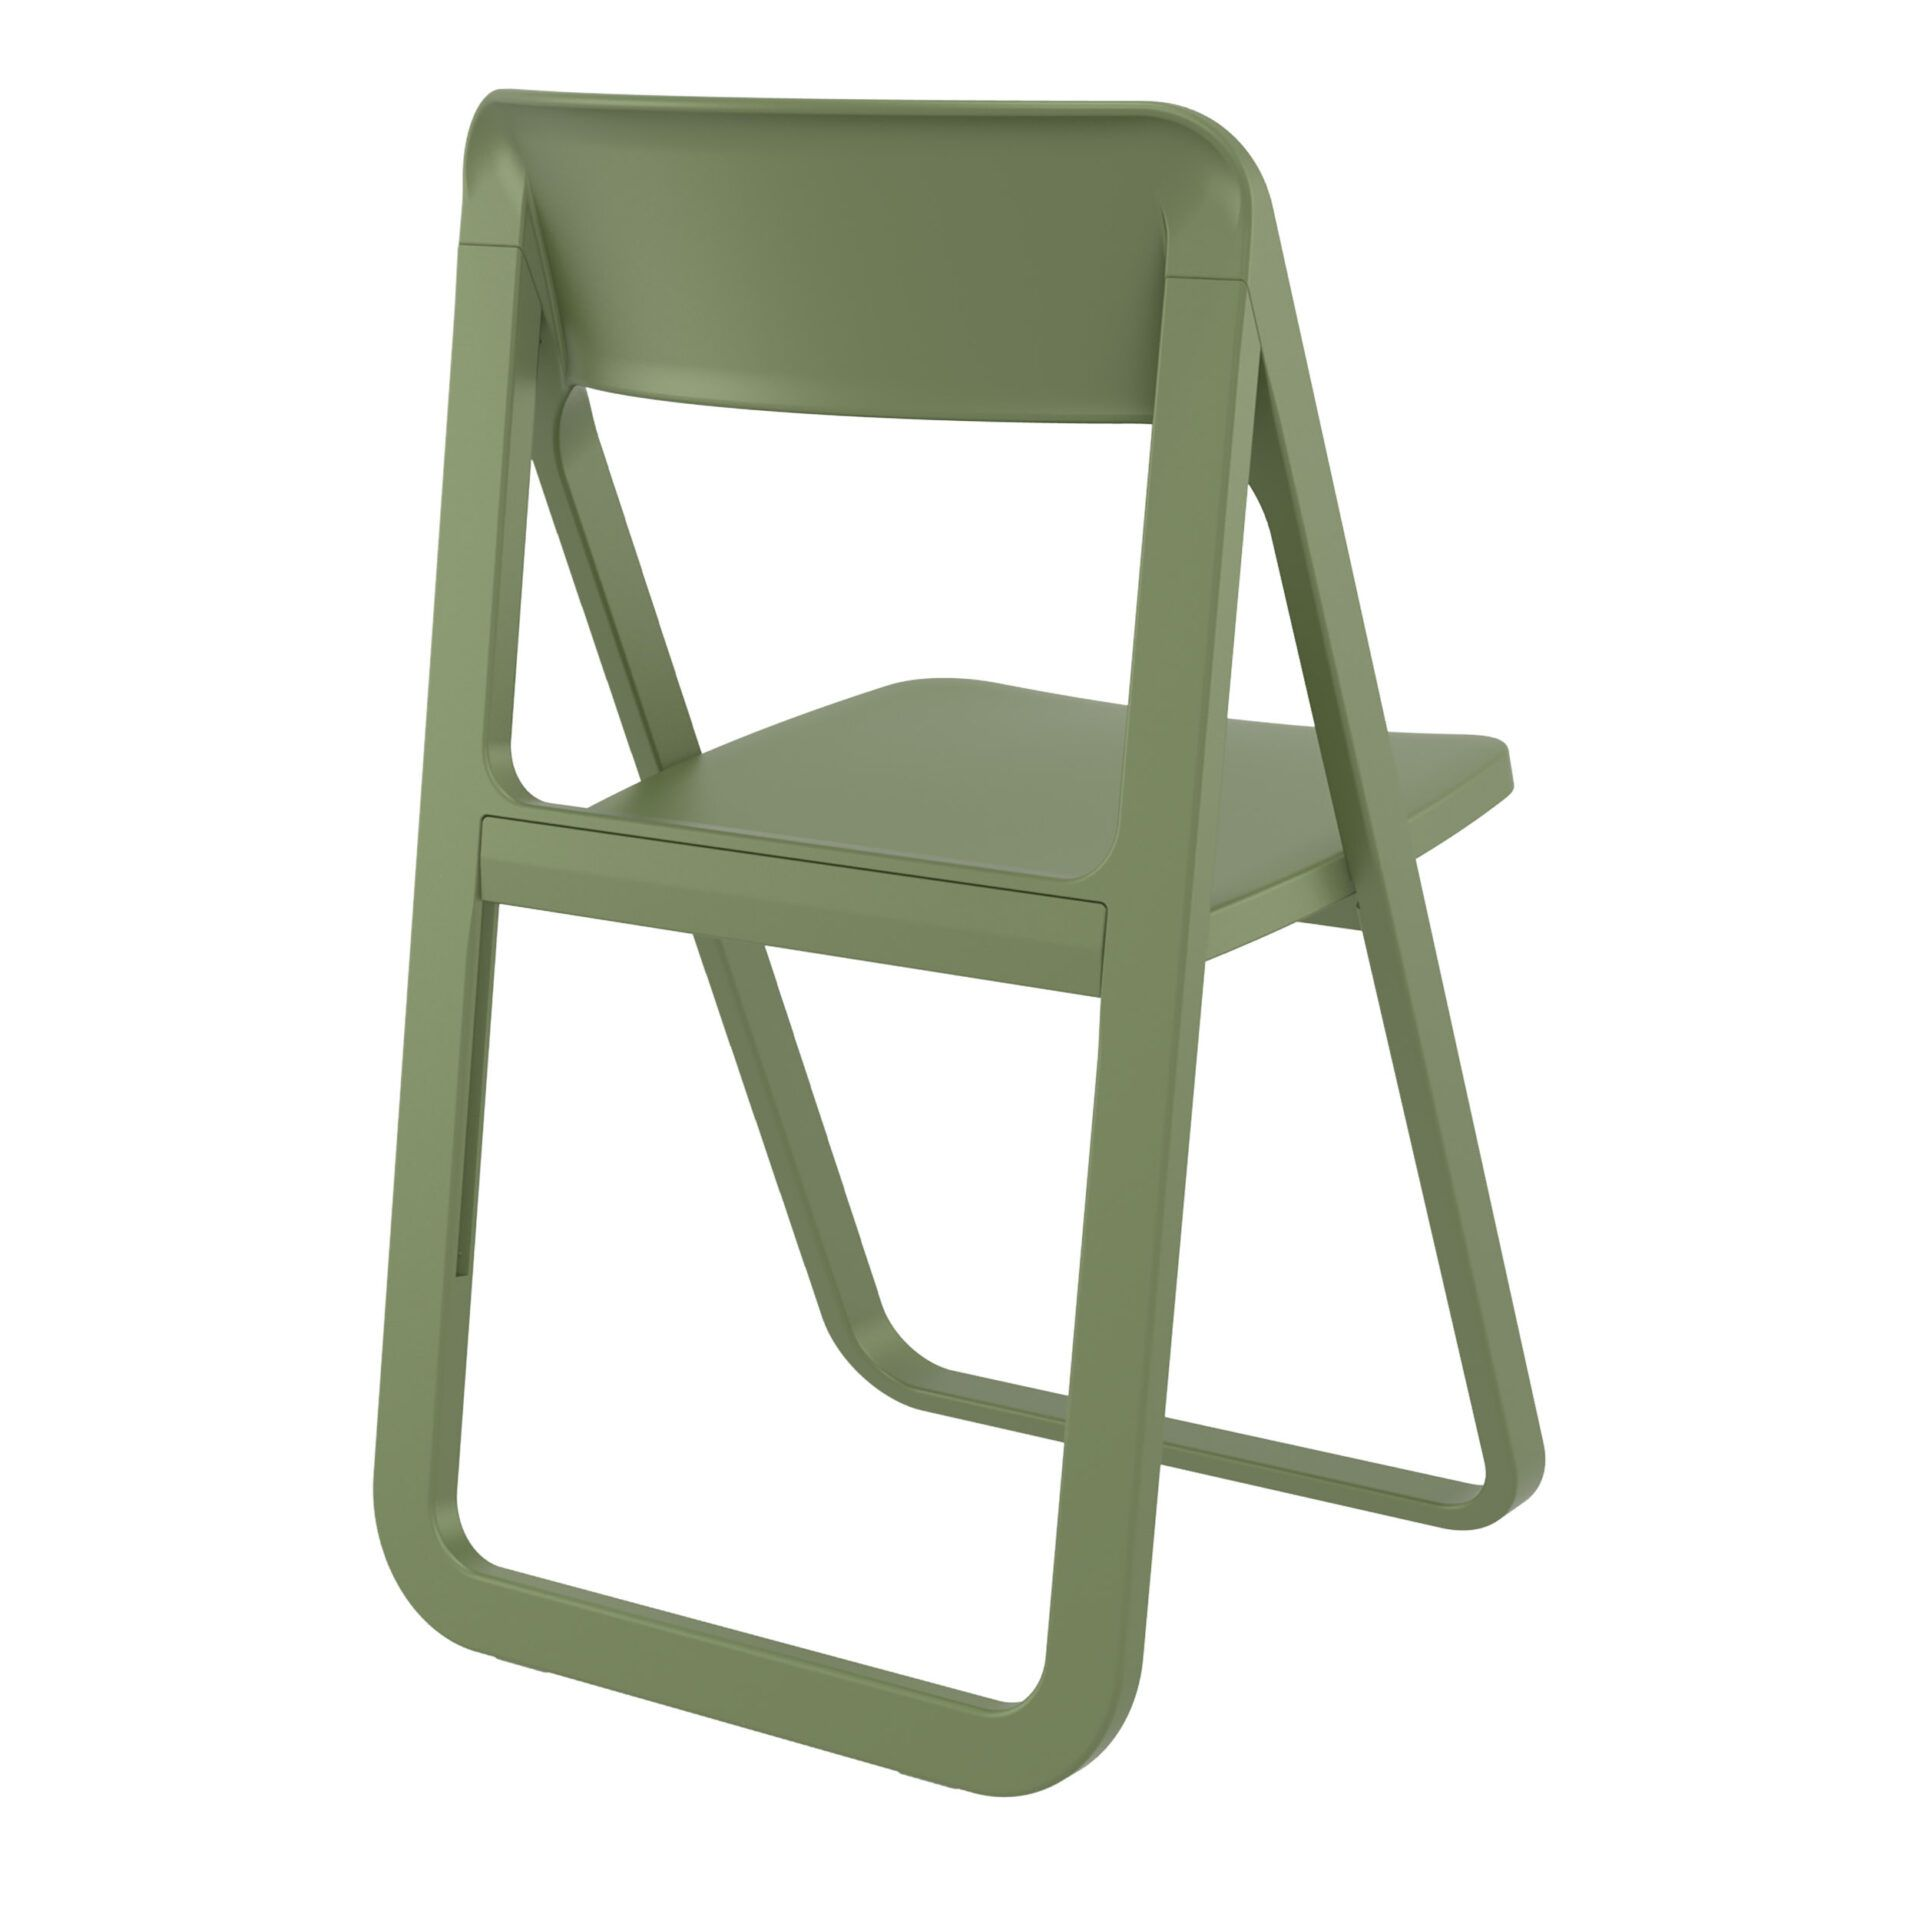 polypropylene dream folding chair olive green back side